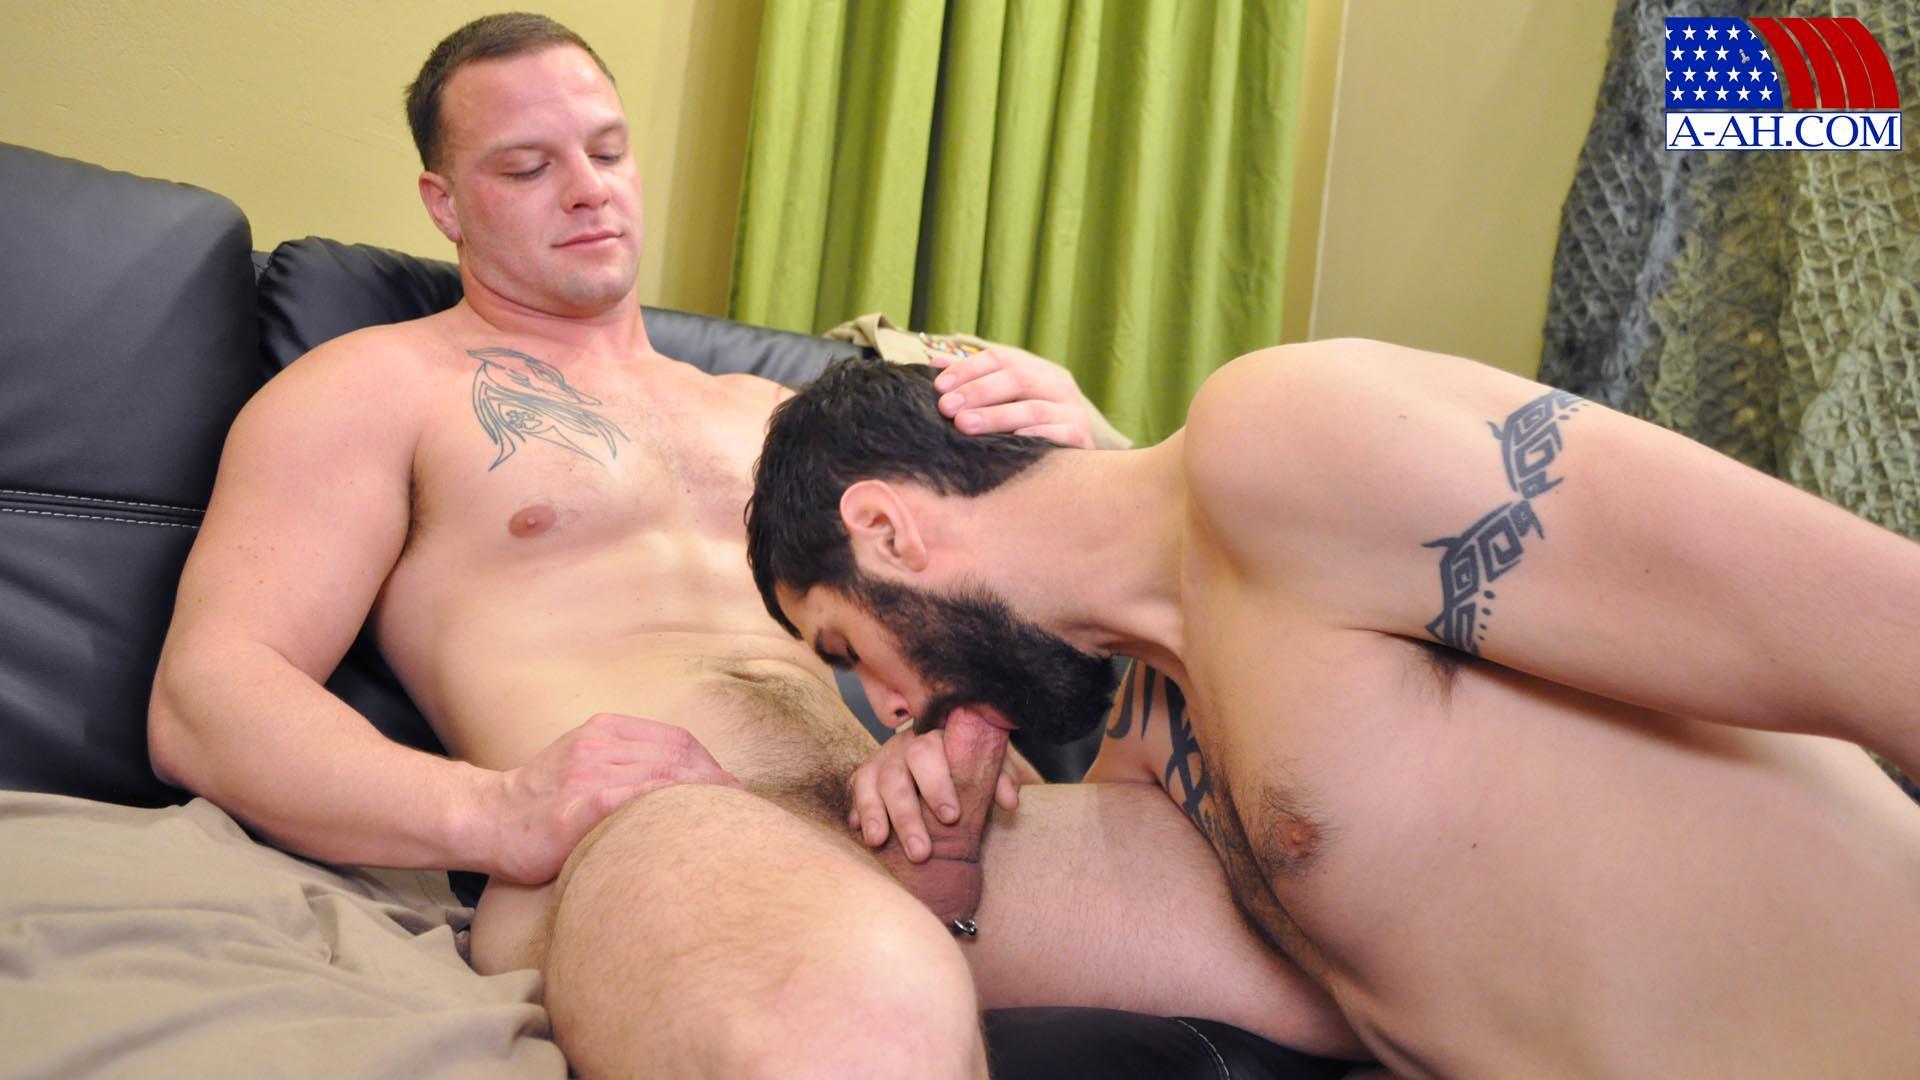 amerikanskiy-gey-seks-video